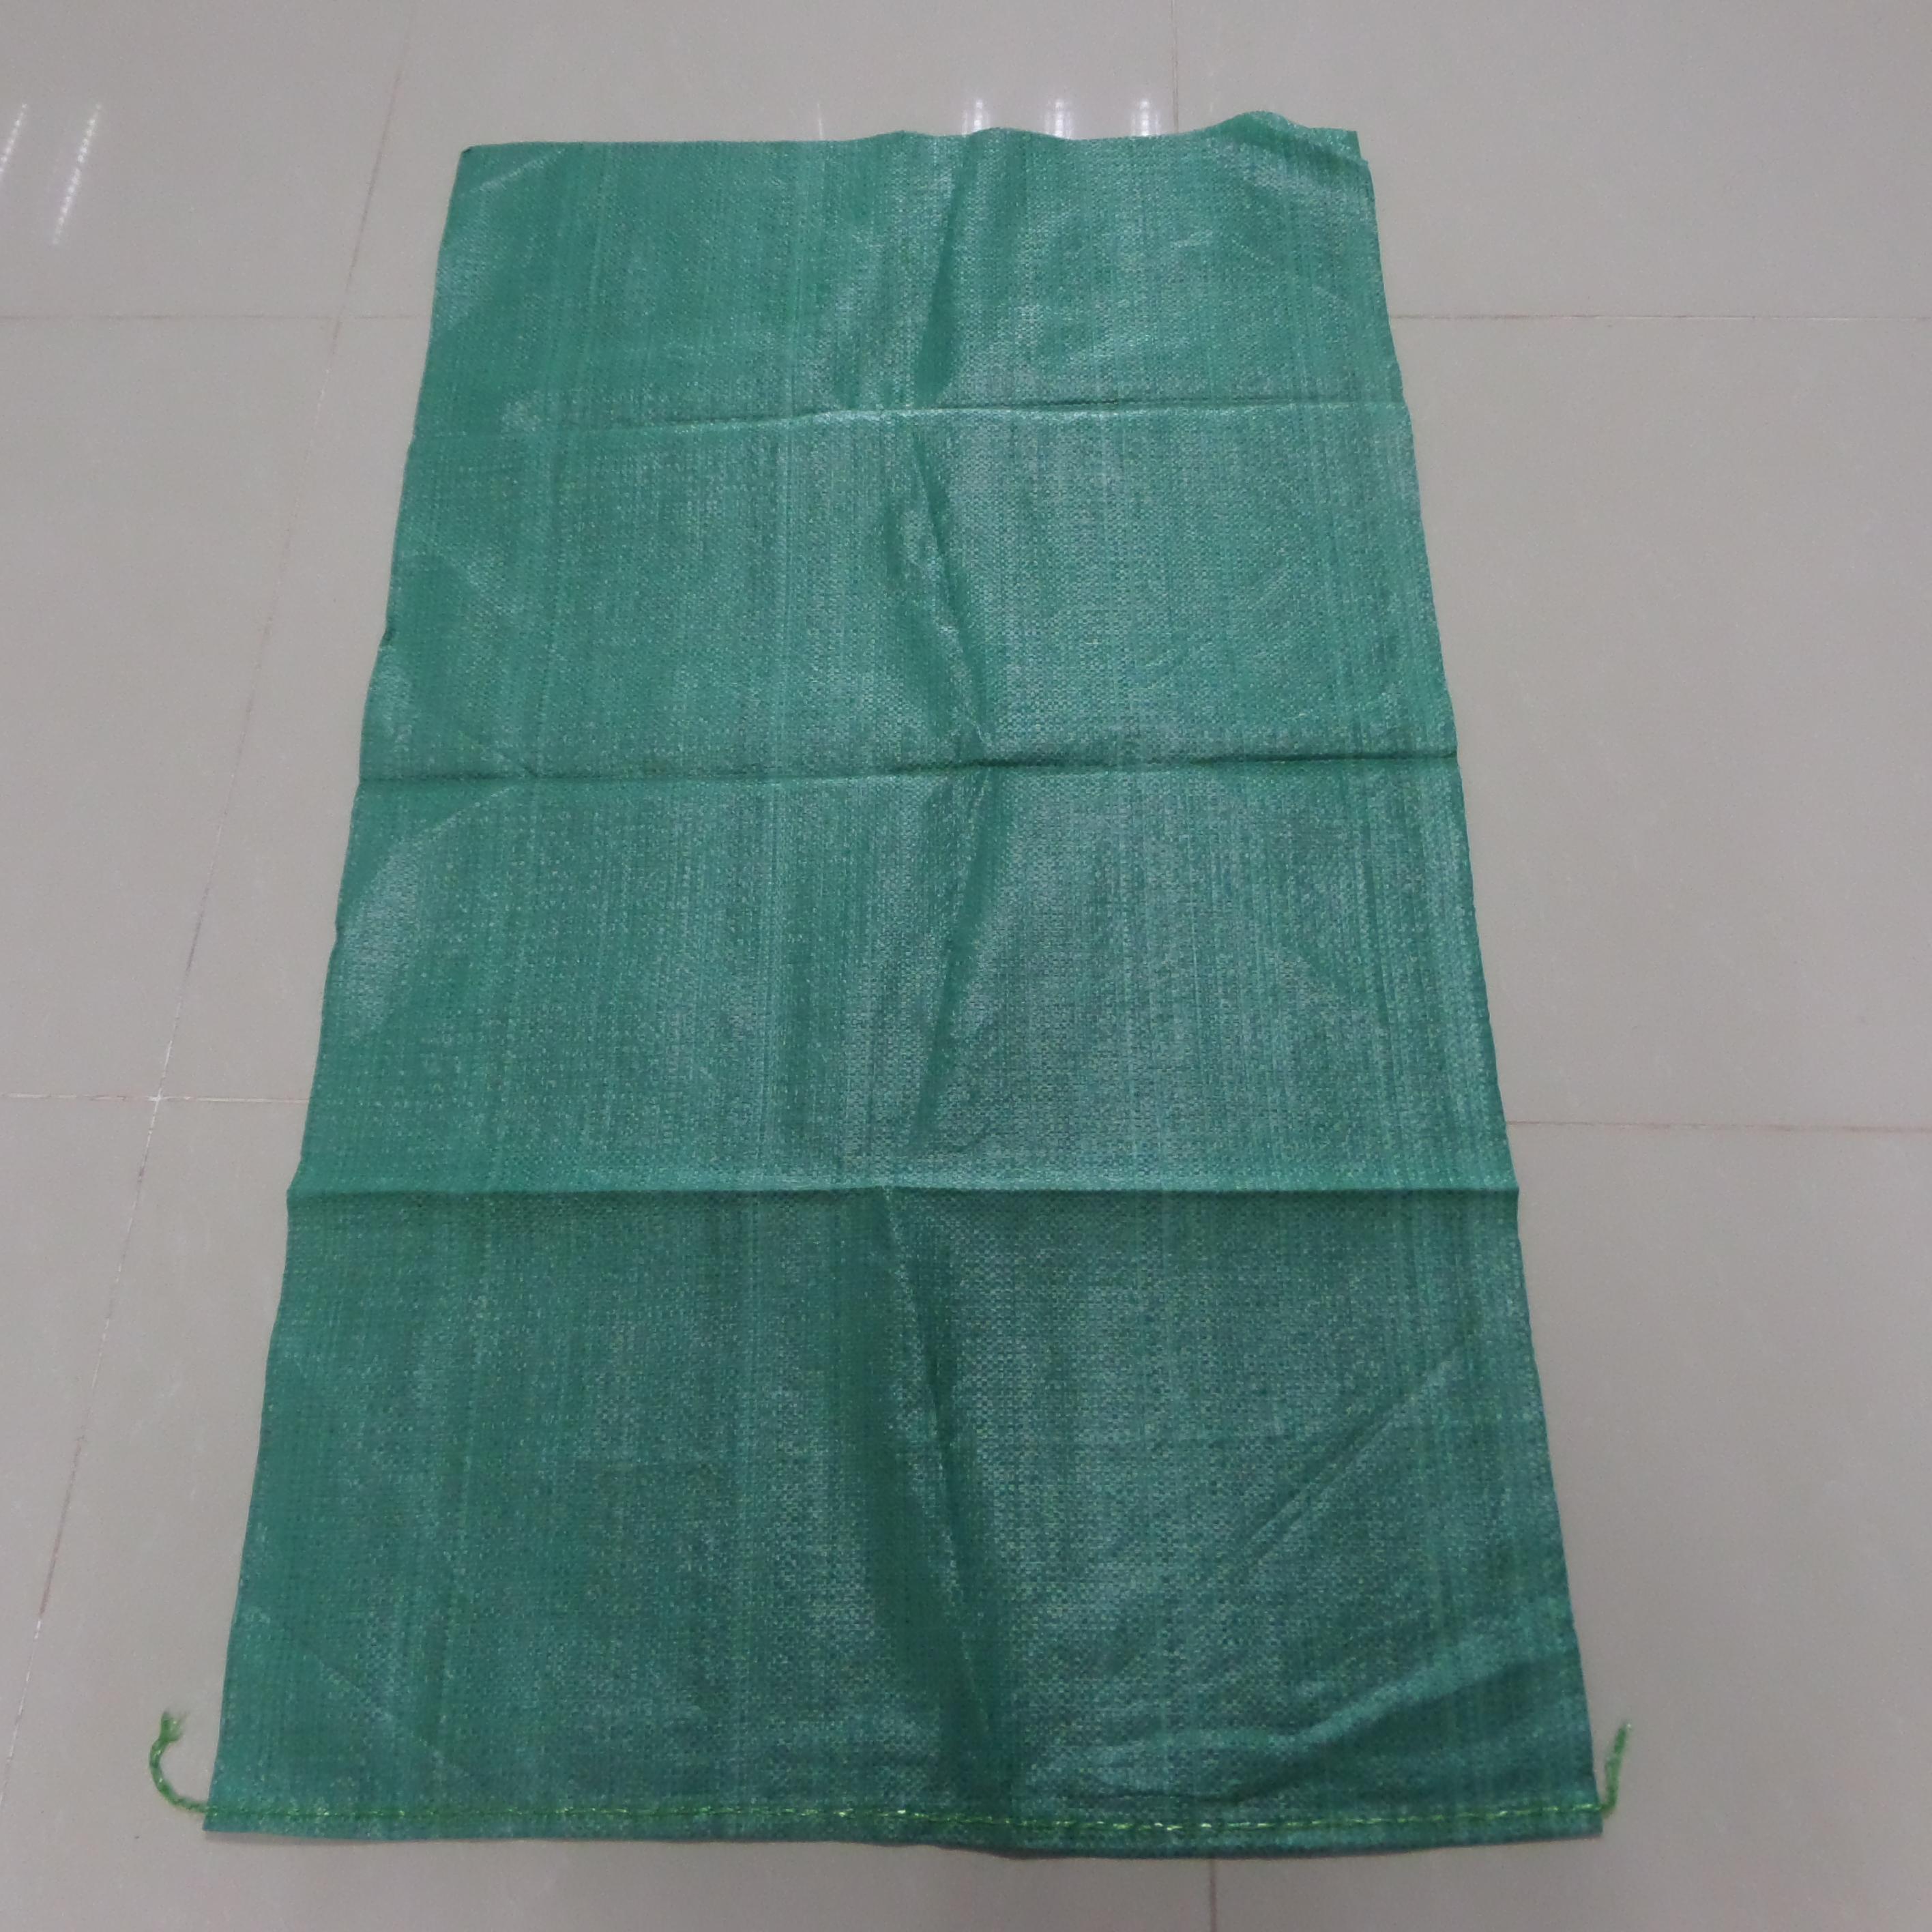 Bao Xanh cốm Kt: 60 x 98 /55 (g/m2)